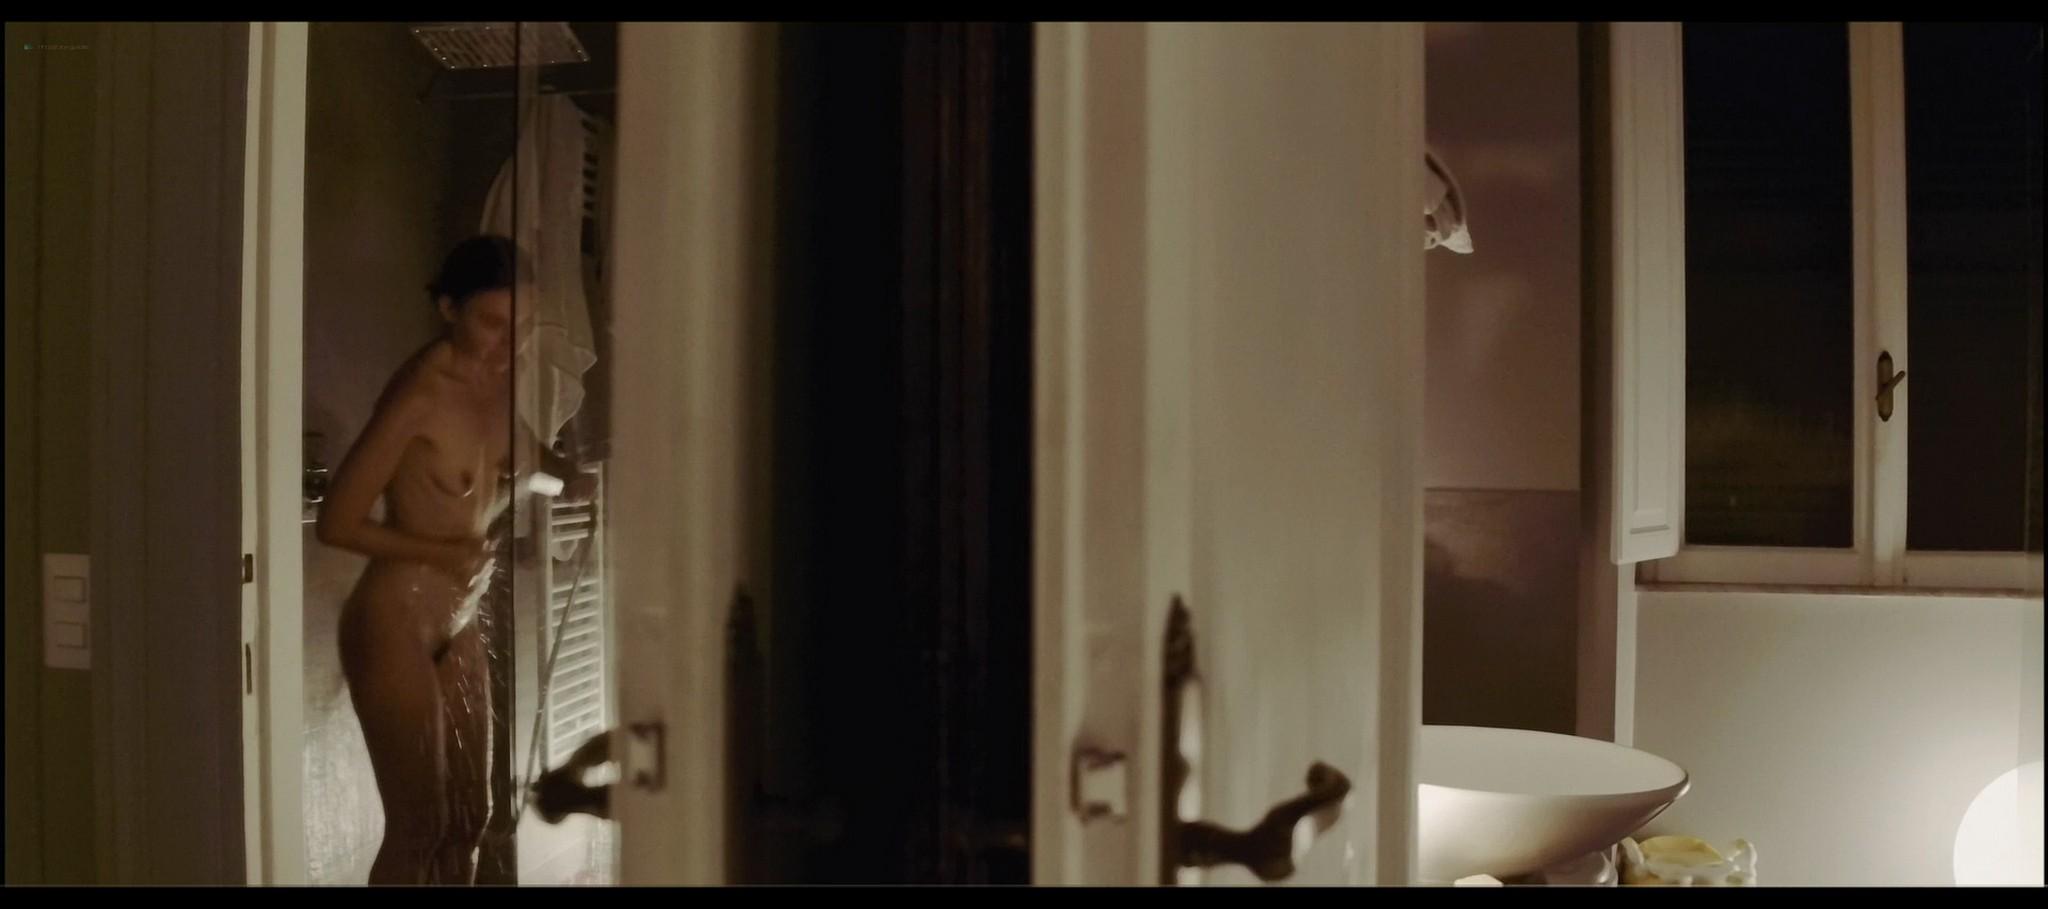 Cristina Chiriac nude full frontal Sofia Rania Dharma Mangia Woods full frontal too Tommaso 2019 HD 1080p Bluray 013